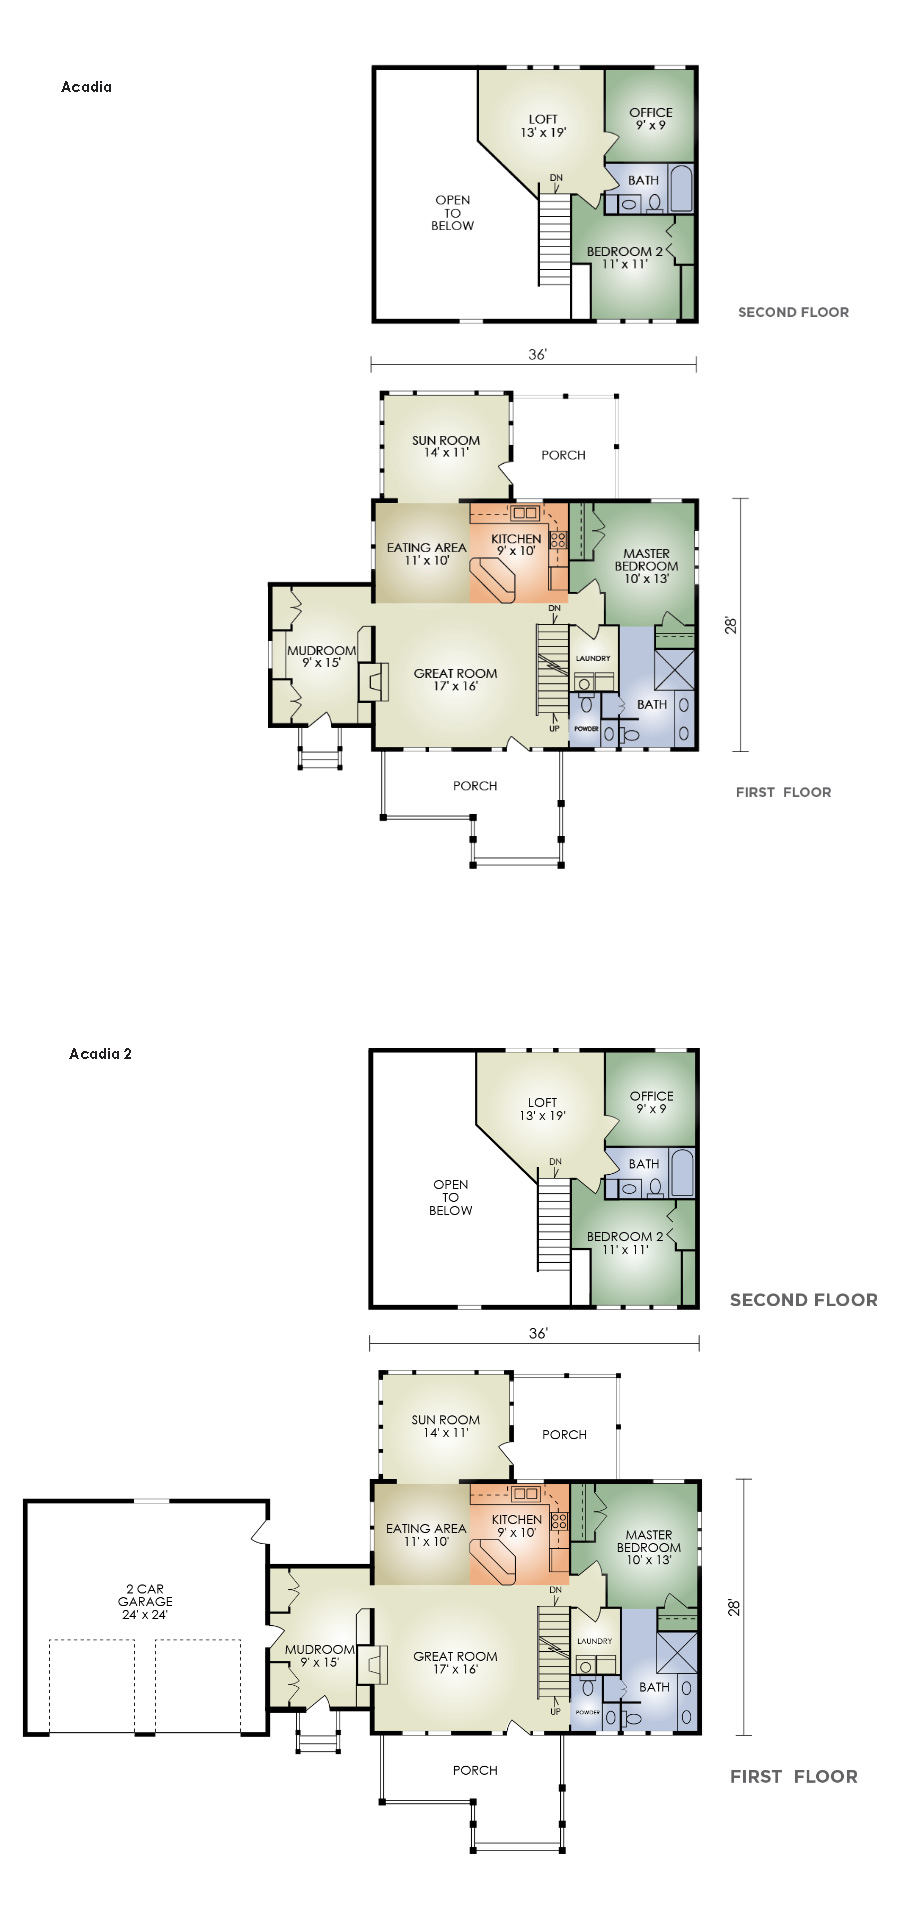 acadia log home floor plan from hochstetler log homes